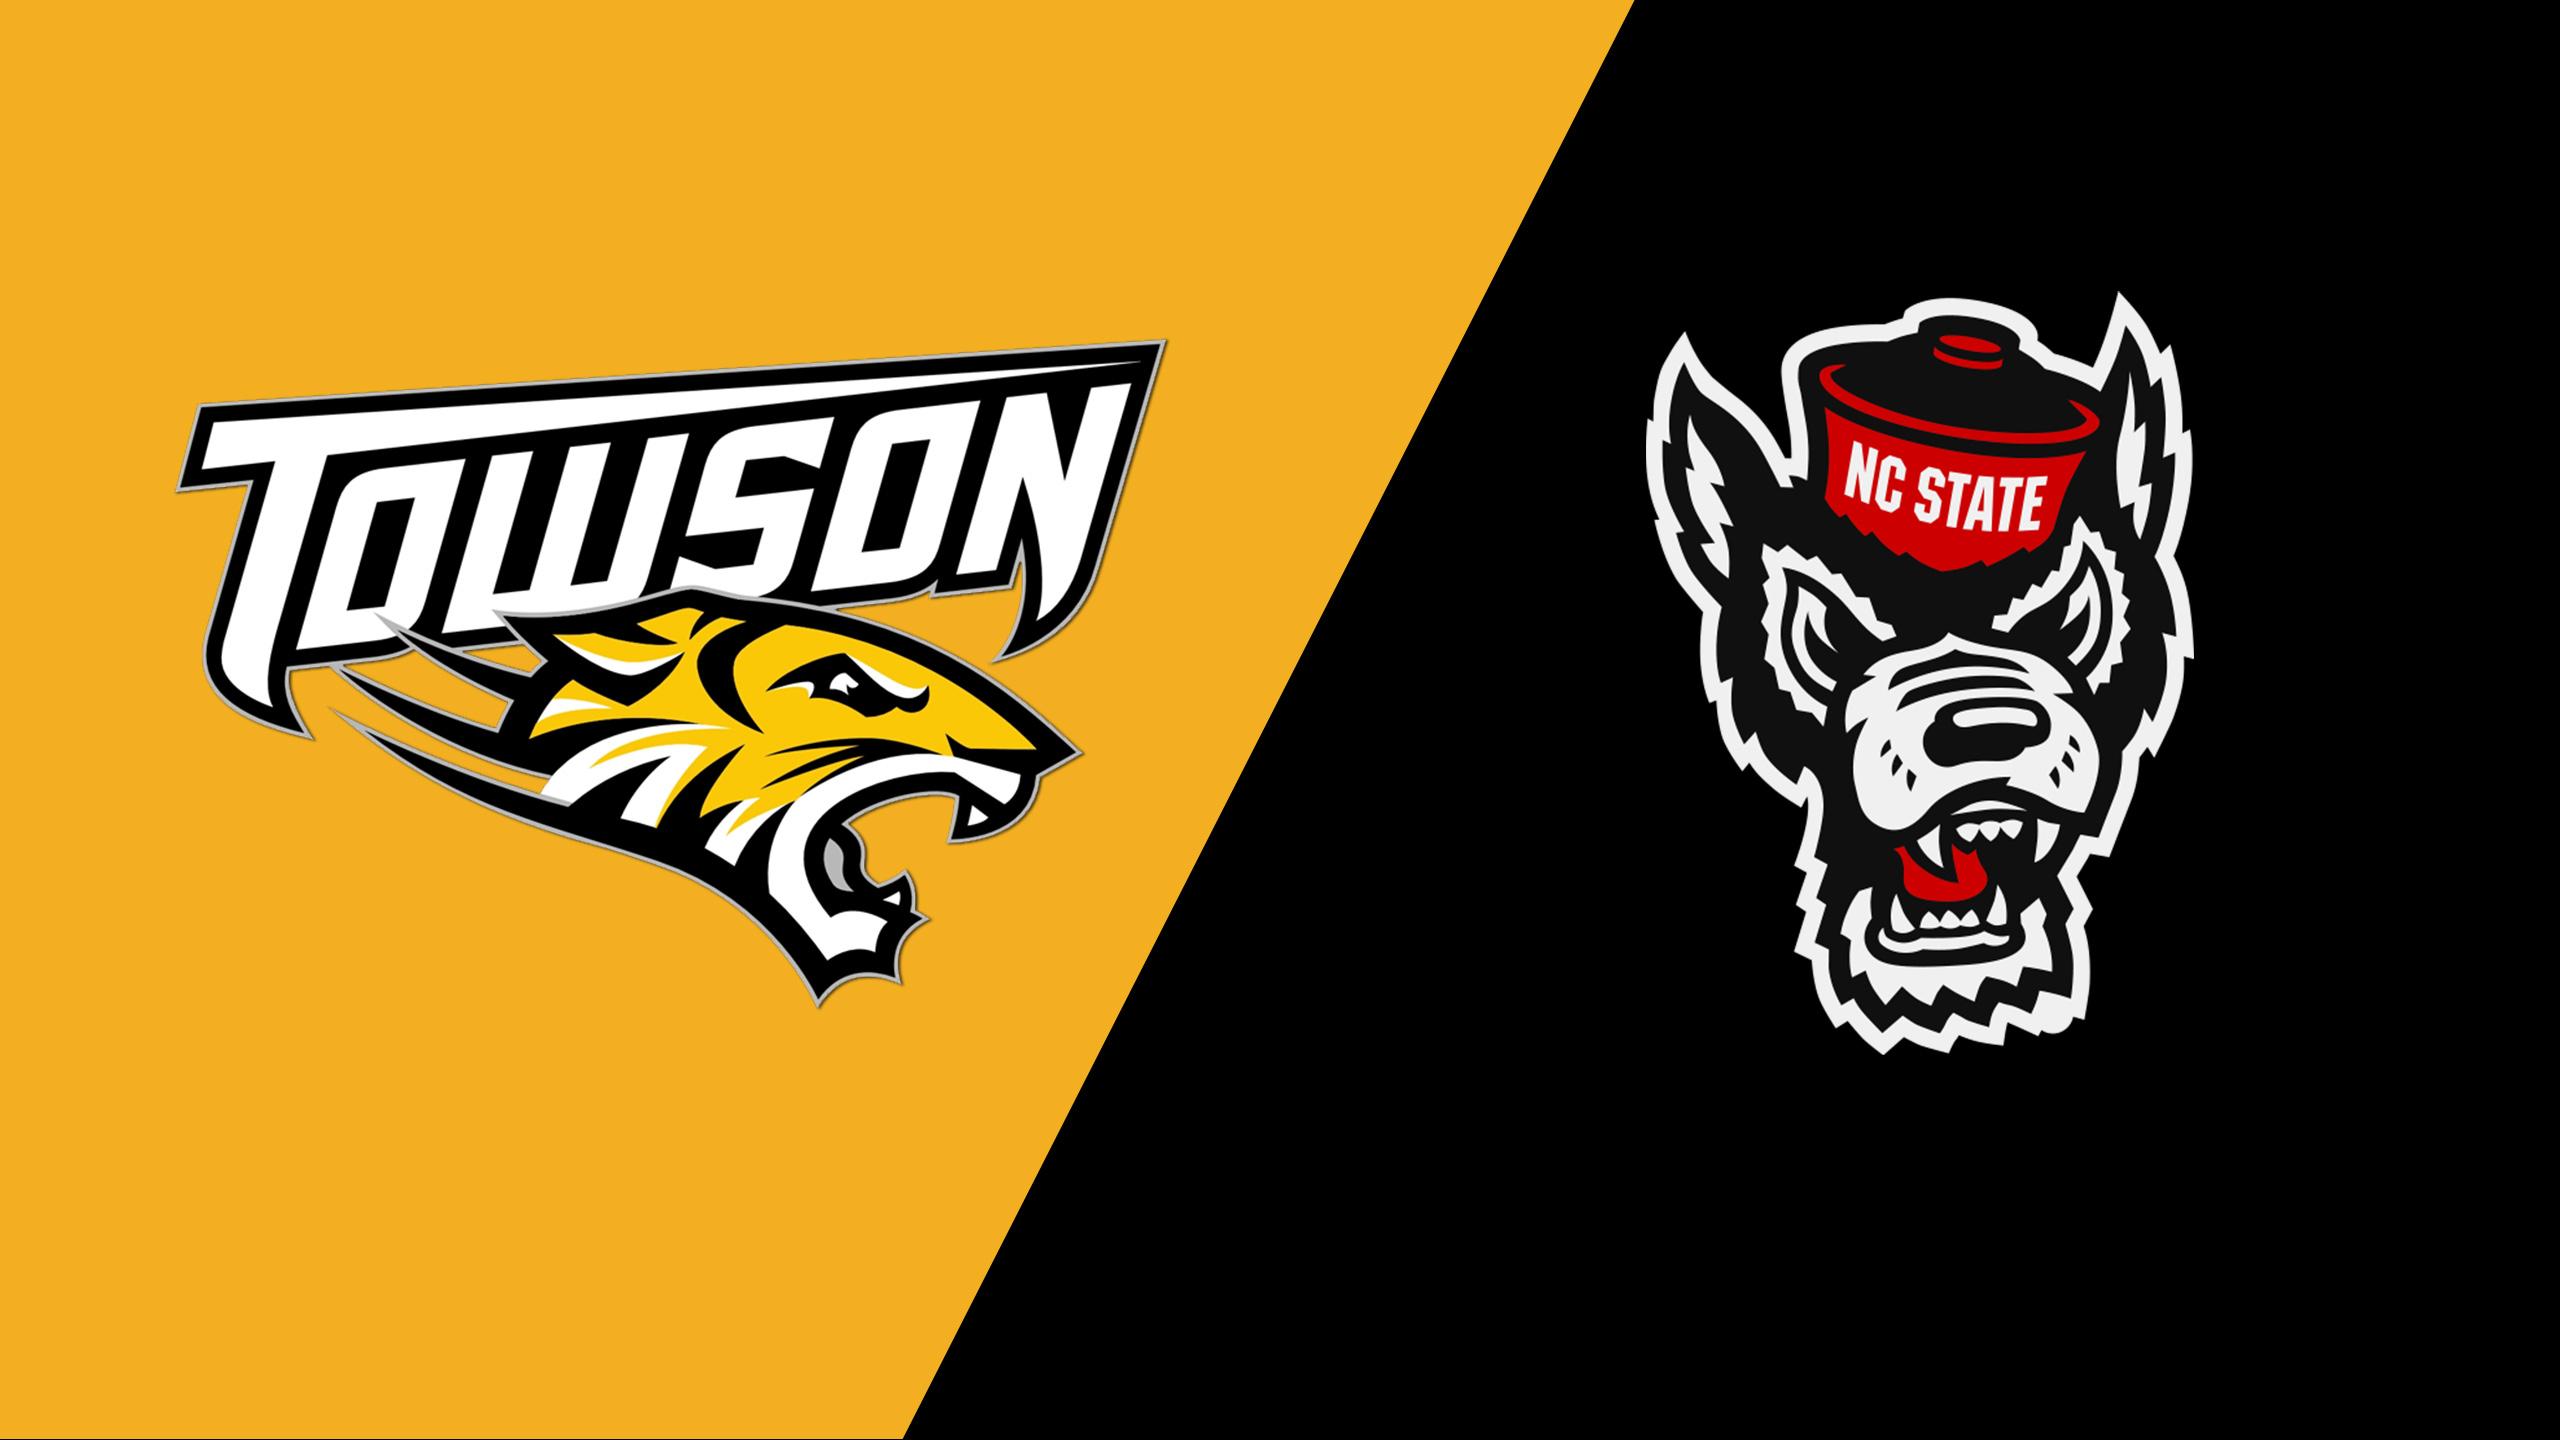 Towson vs. NC State (Baseball)